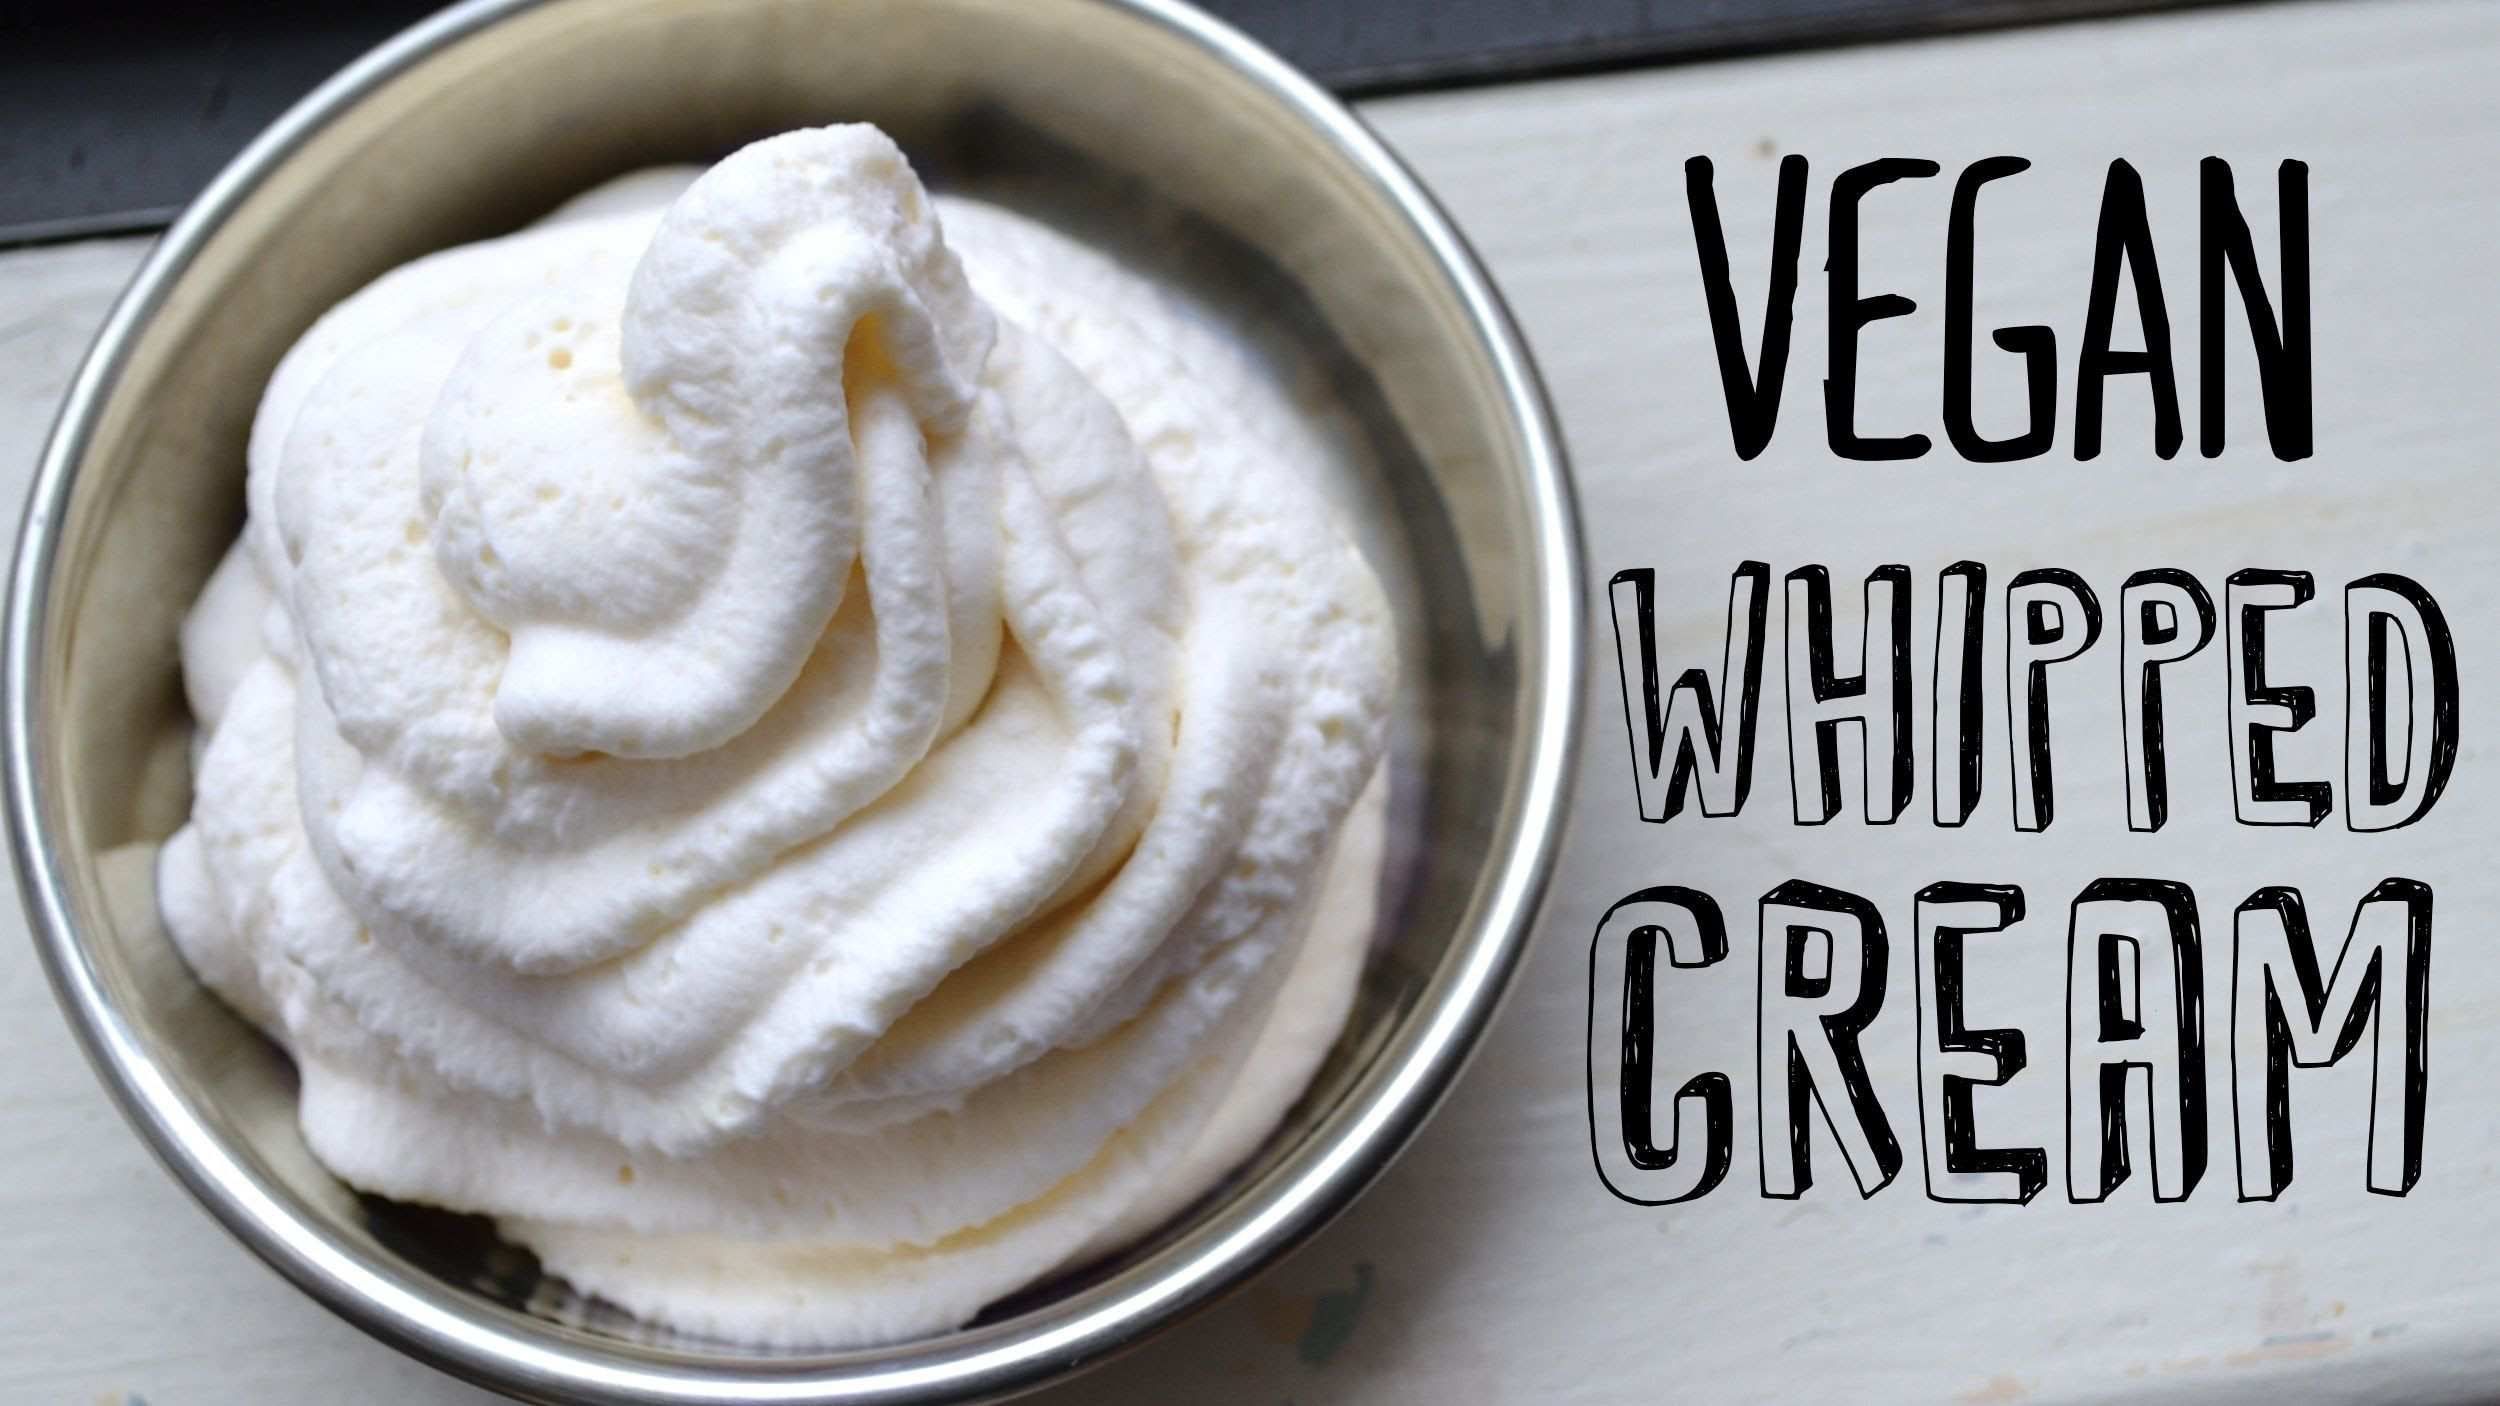 How To Make Vegan Whipped Cream Fablunch Vegan Whipped Cream Recipes With Whipping Cream Coconut Whipped Cream